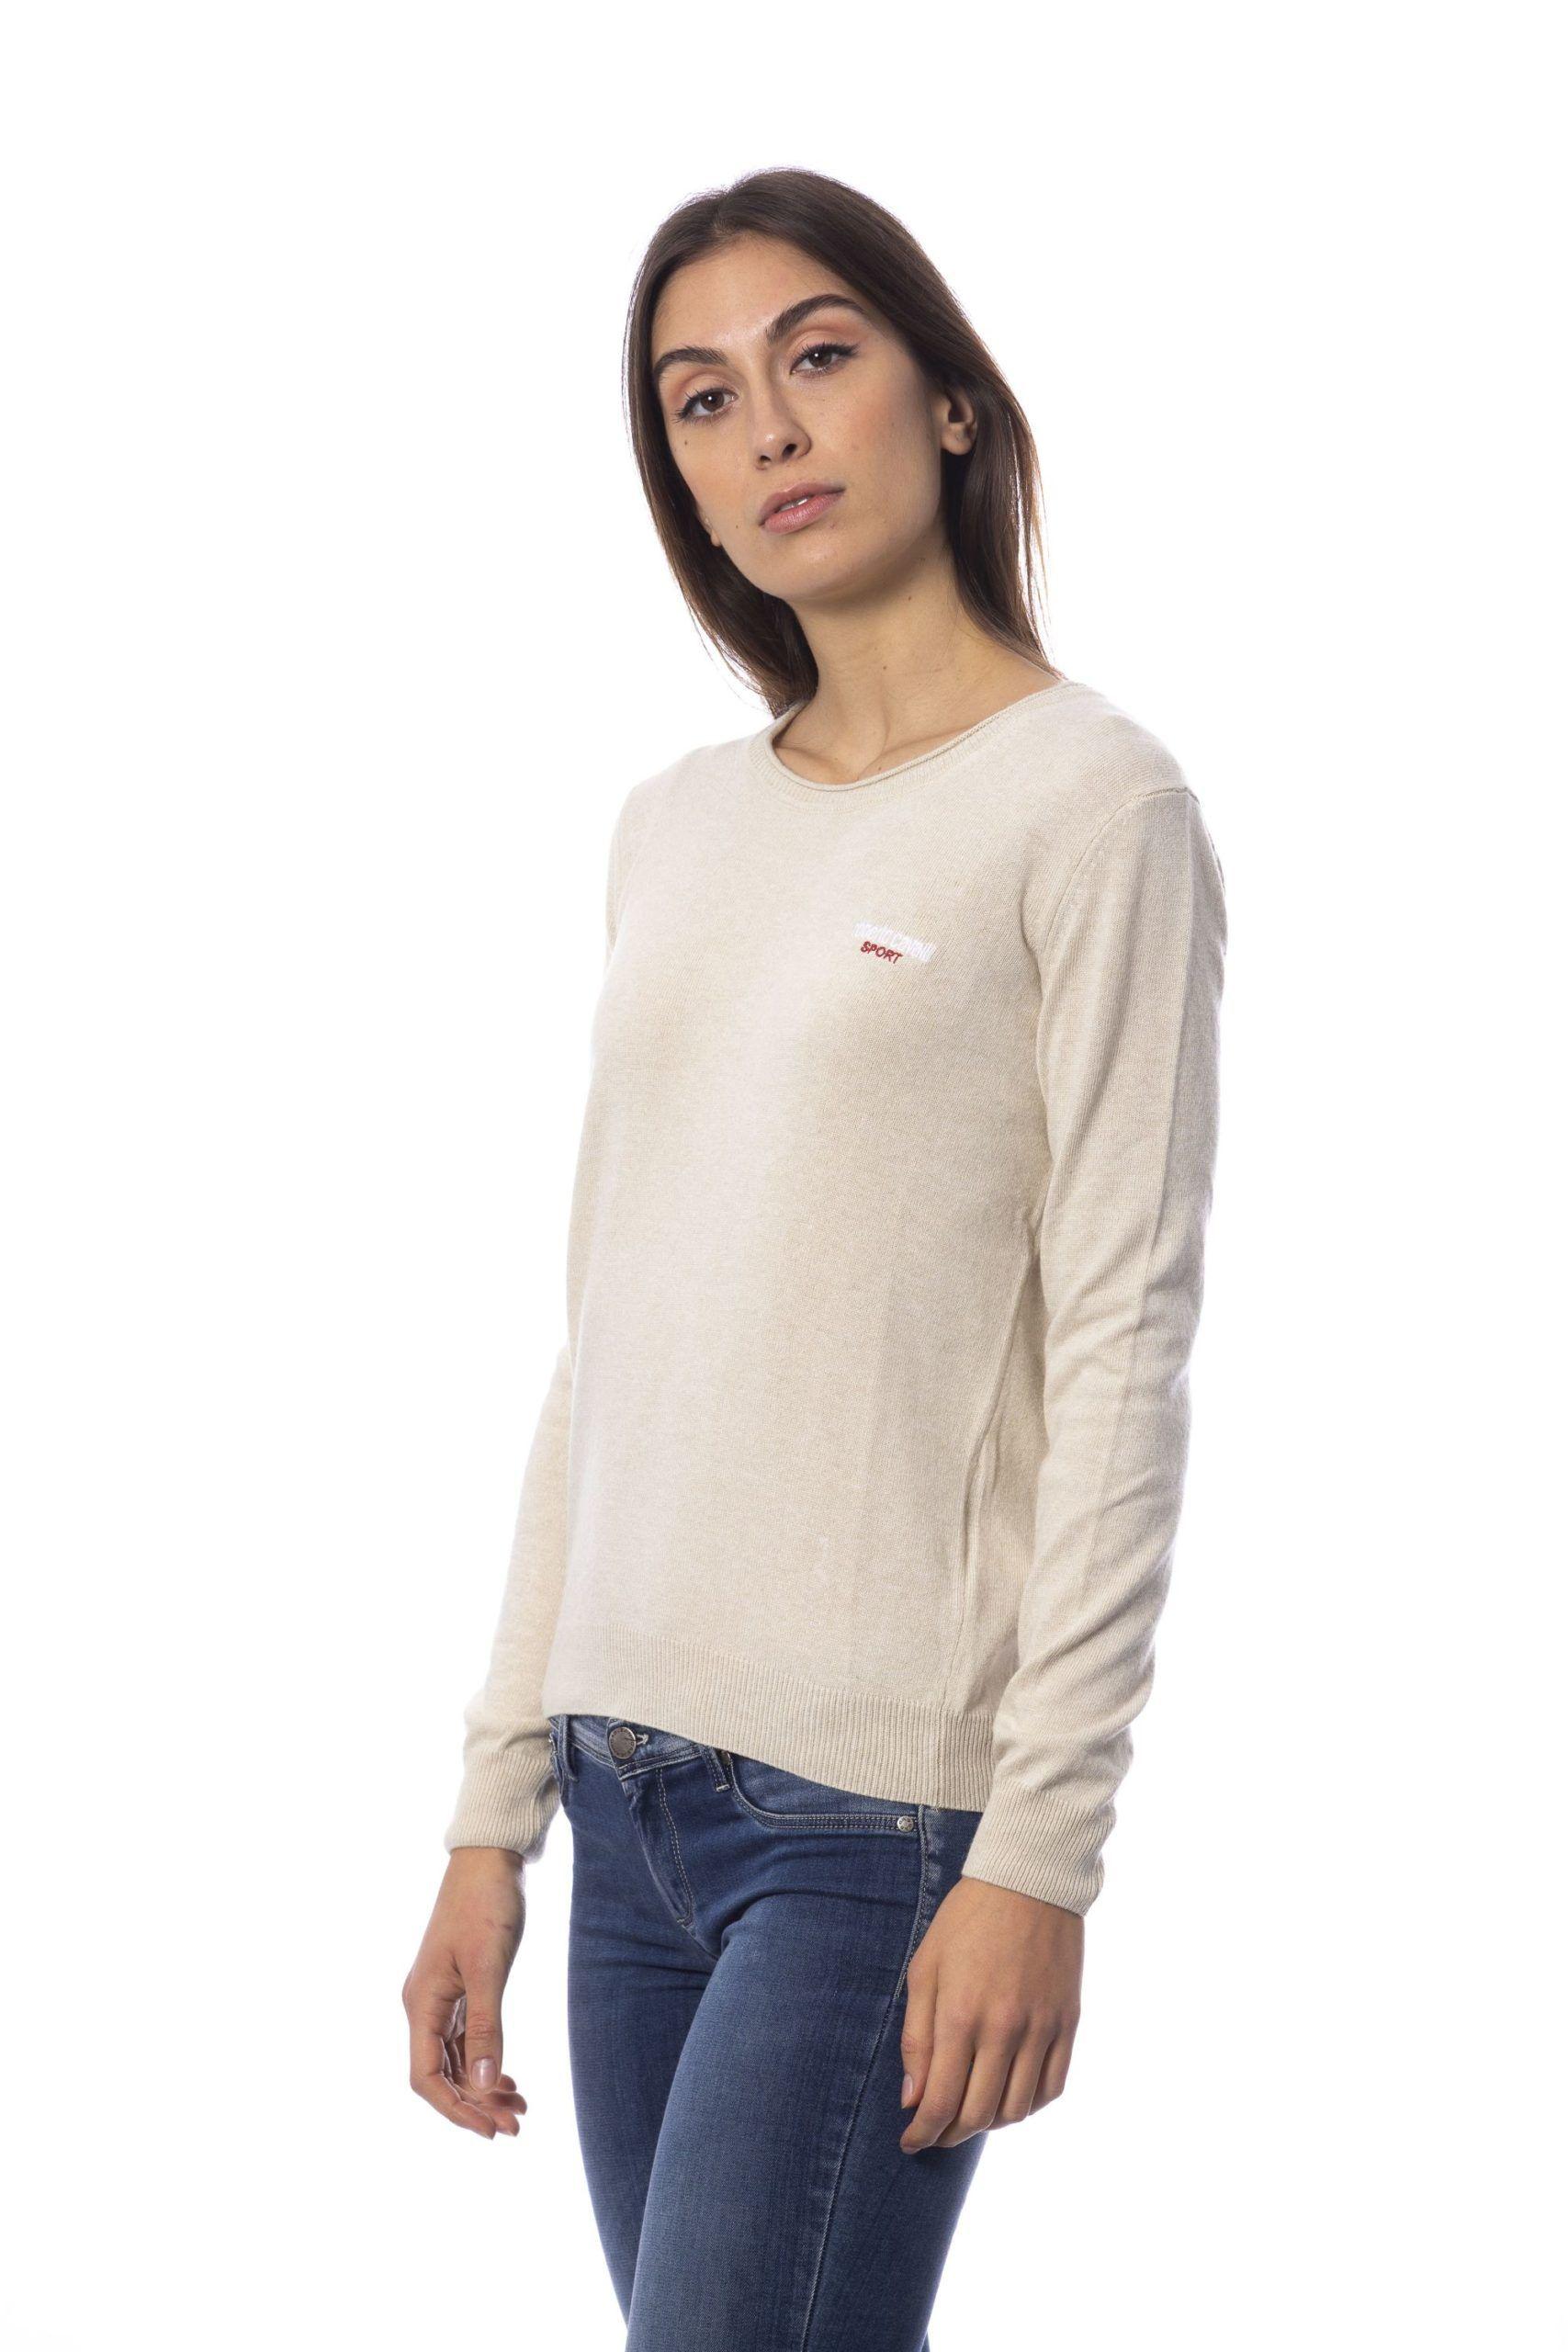 Roberto Cavalli Sport Beige Sweater